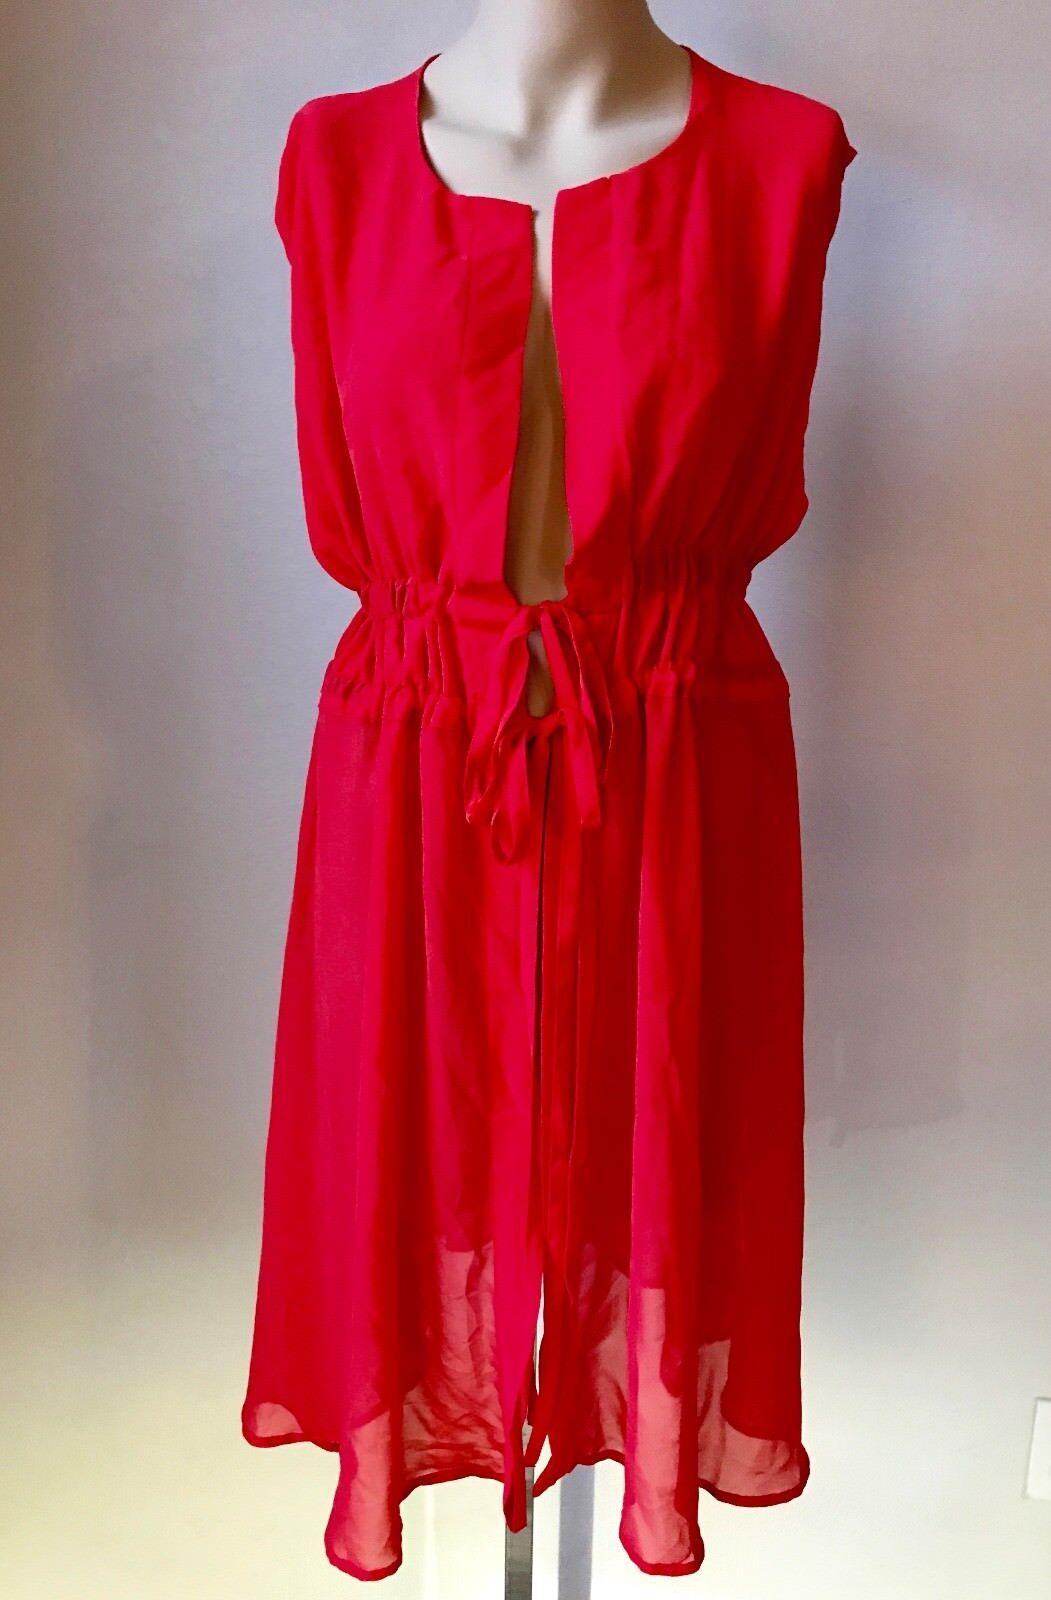 NWT GOTTEX SHEER RED KIMONO COVERUP DRESS S SMALL   SFS